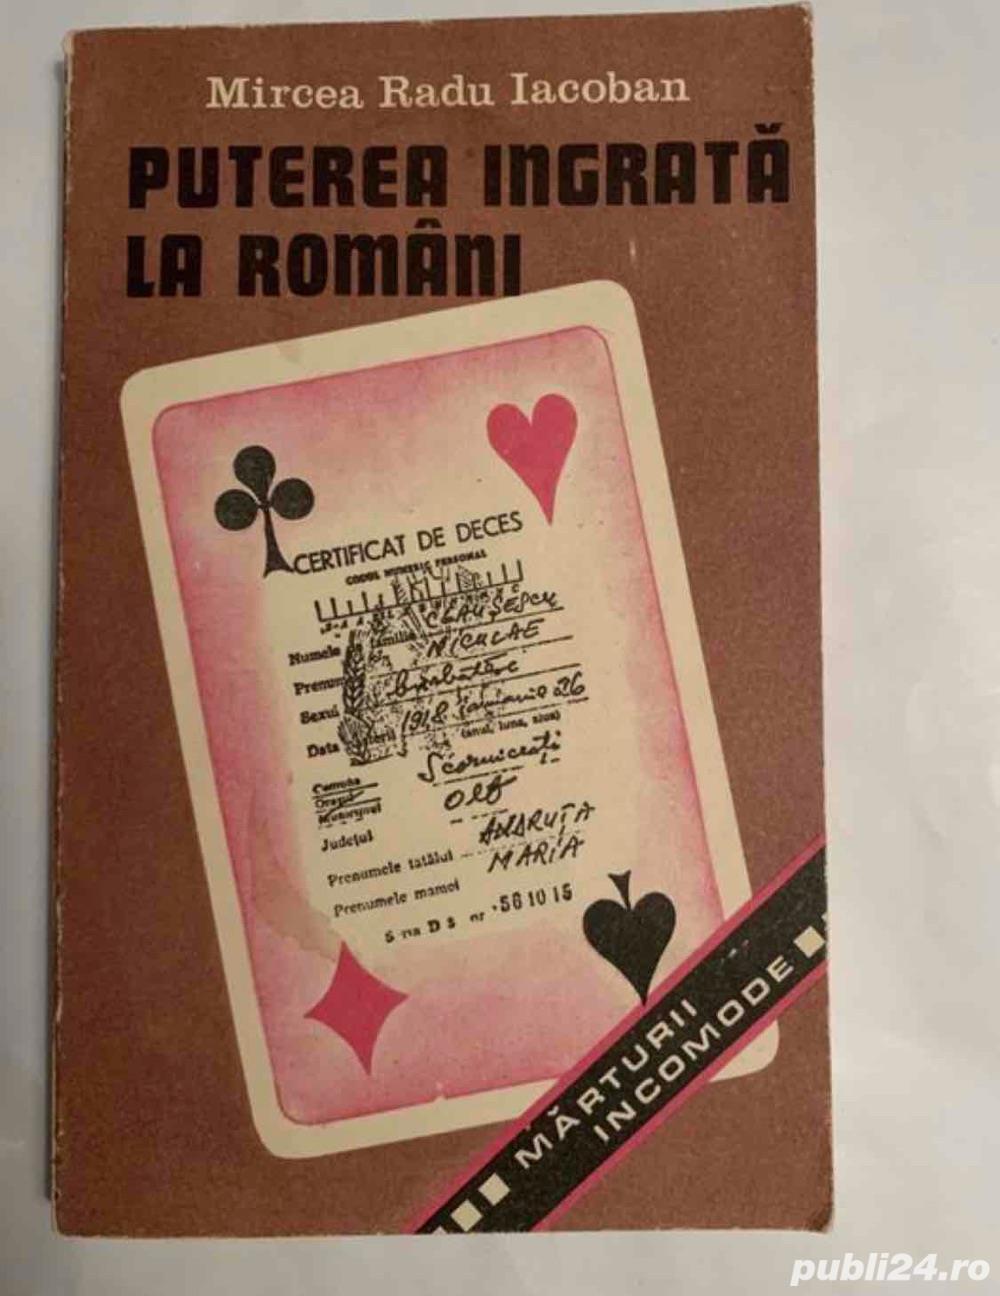 Puterea ingrata la romani, Mircea Radu Iacoban